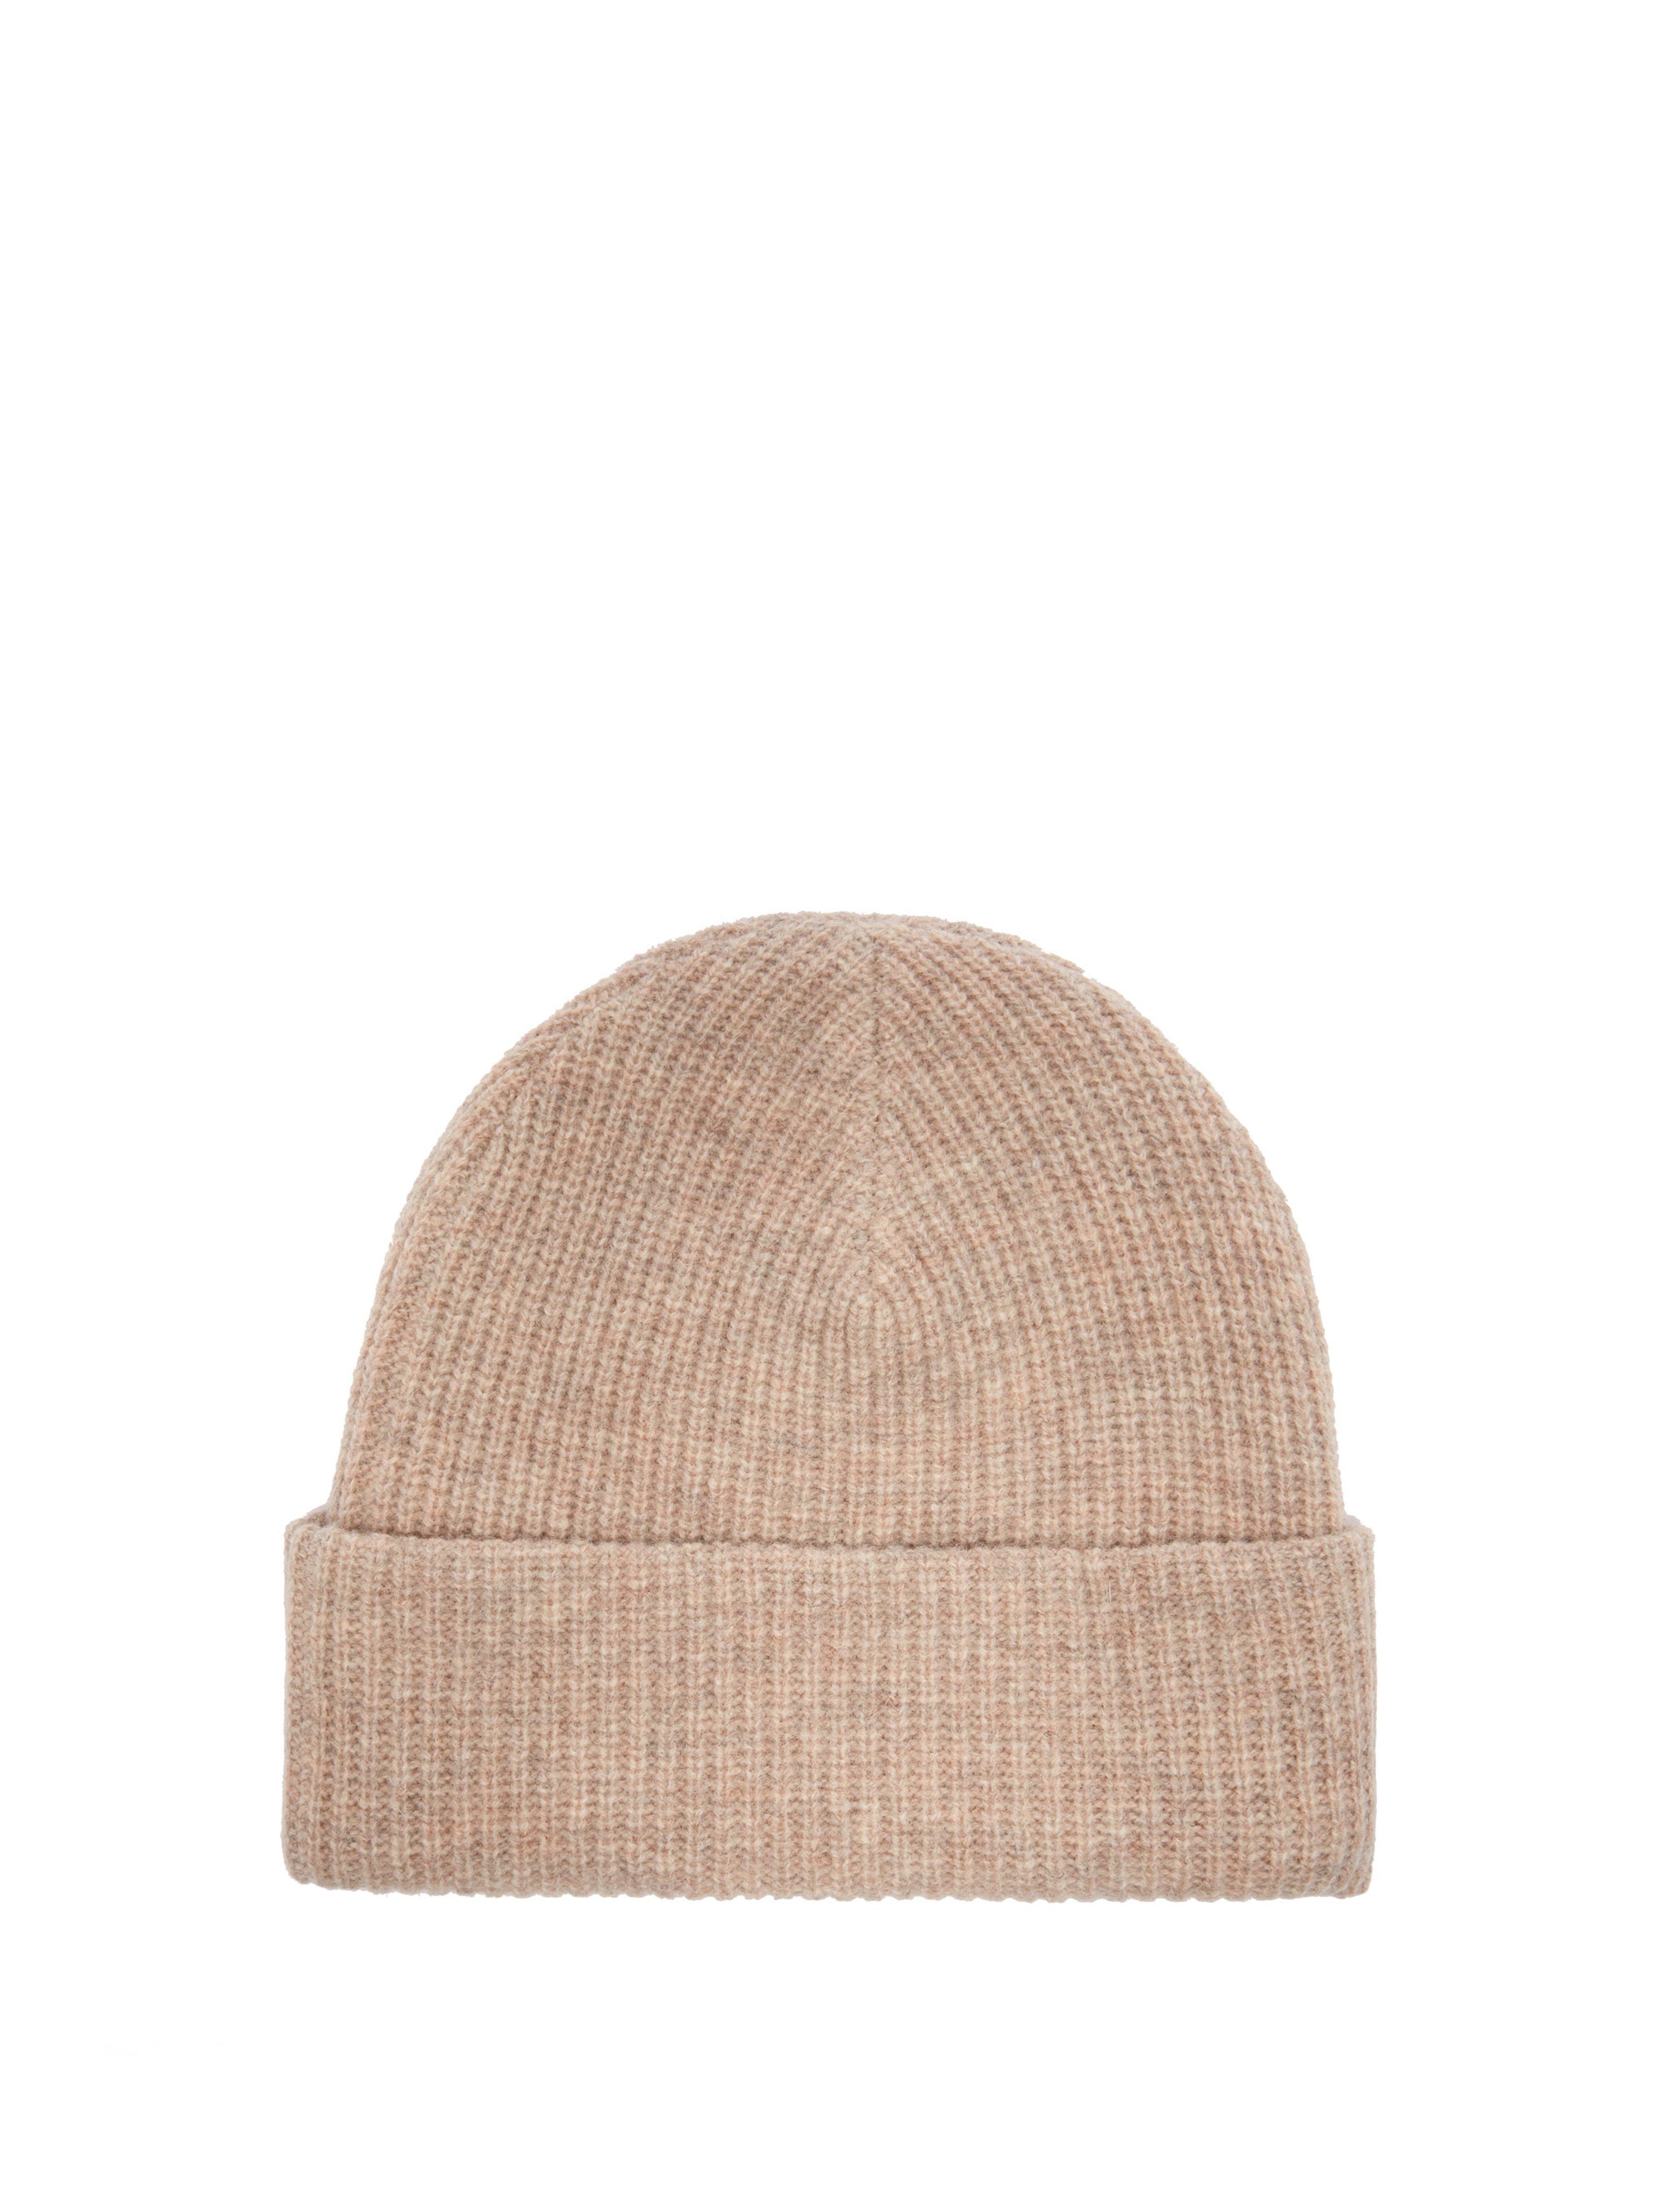 Ganni Hatley Wool Blend Beanie Hat in Natural - Lyst e02acfbbb937